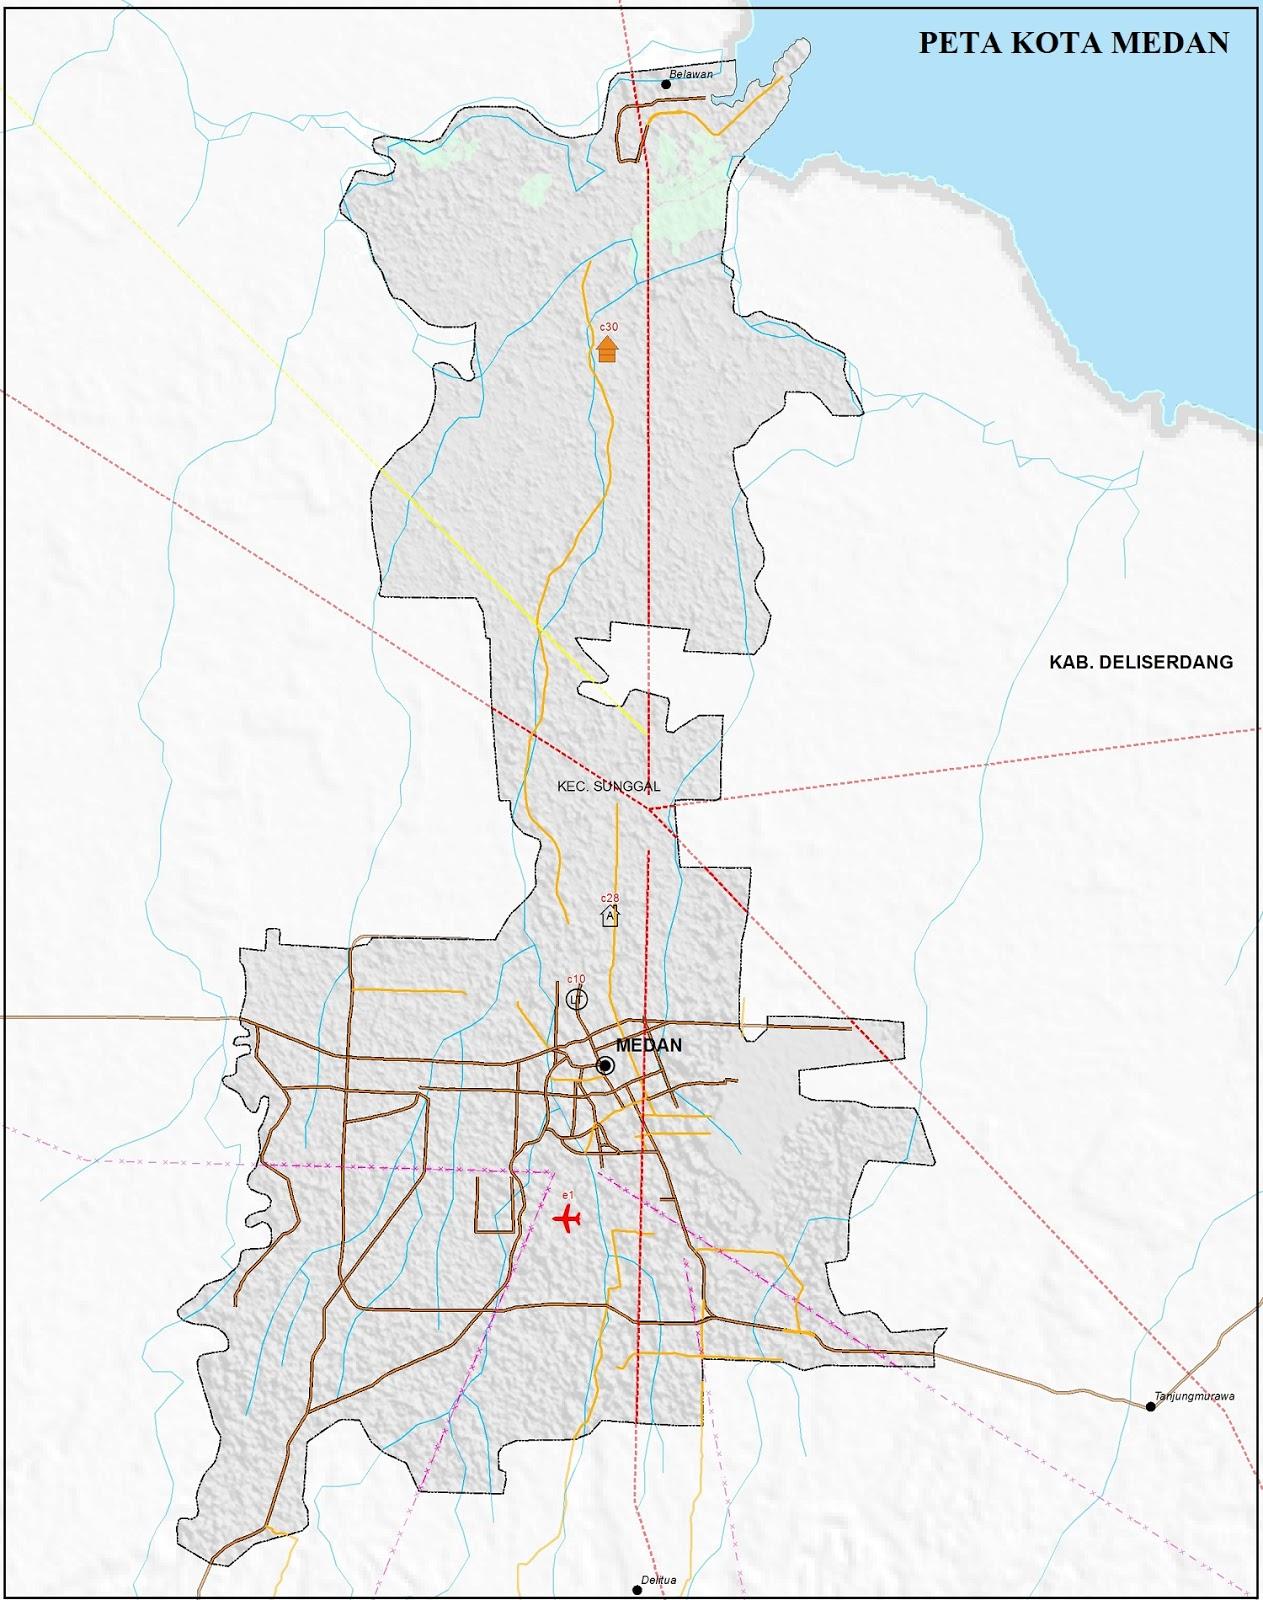 Peta Jalan di Kota Medan